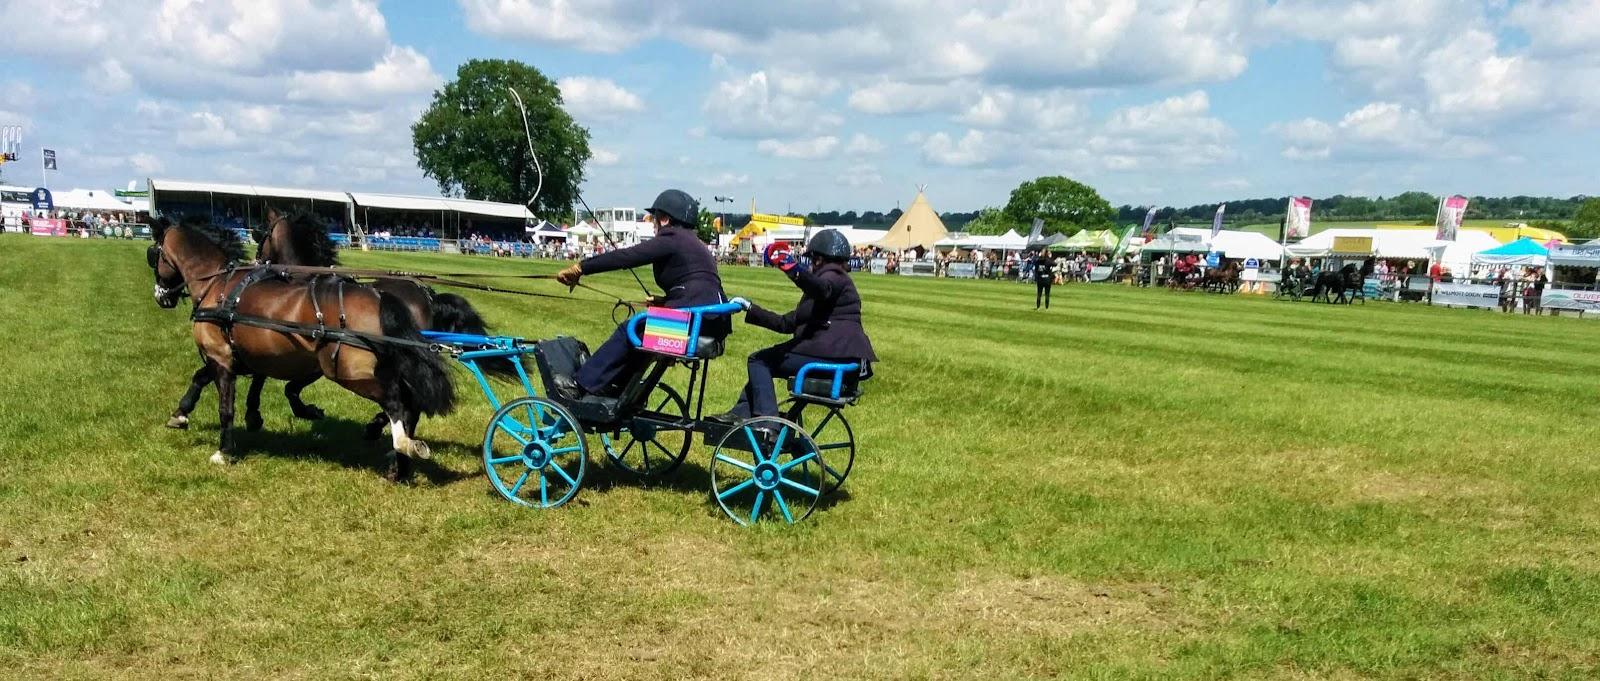 Pony cart at Hertfordshire county show